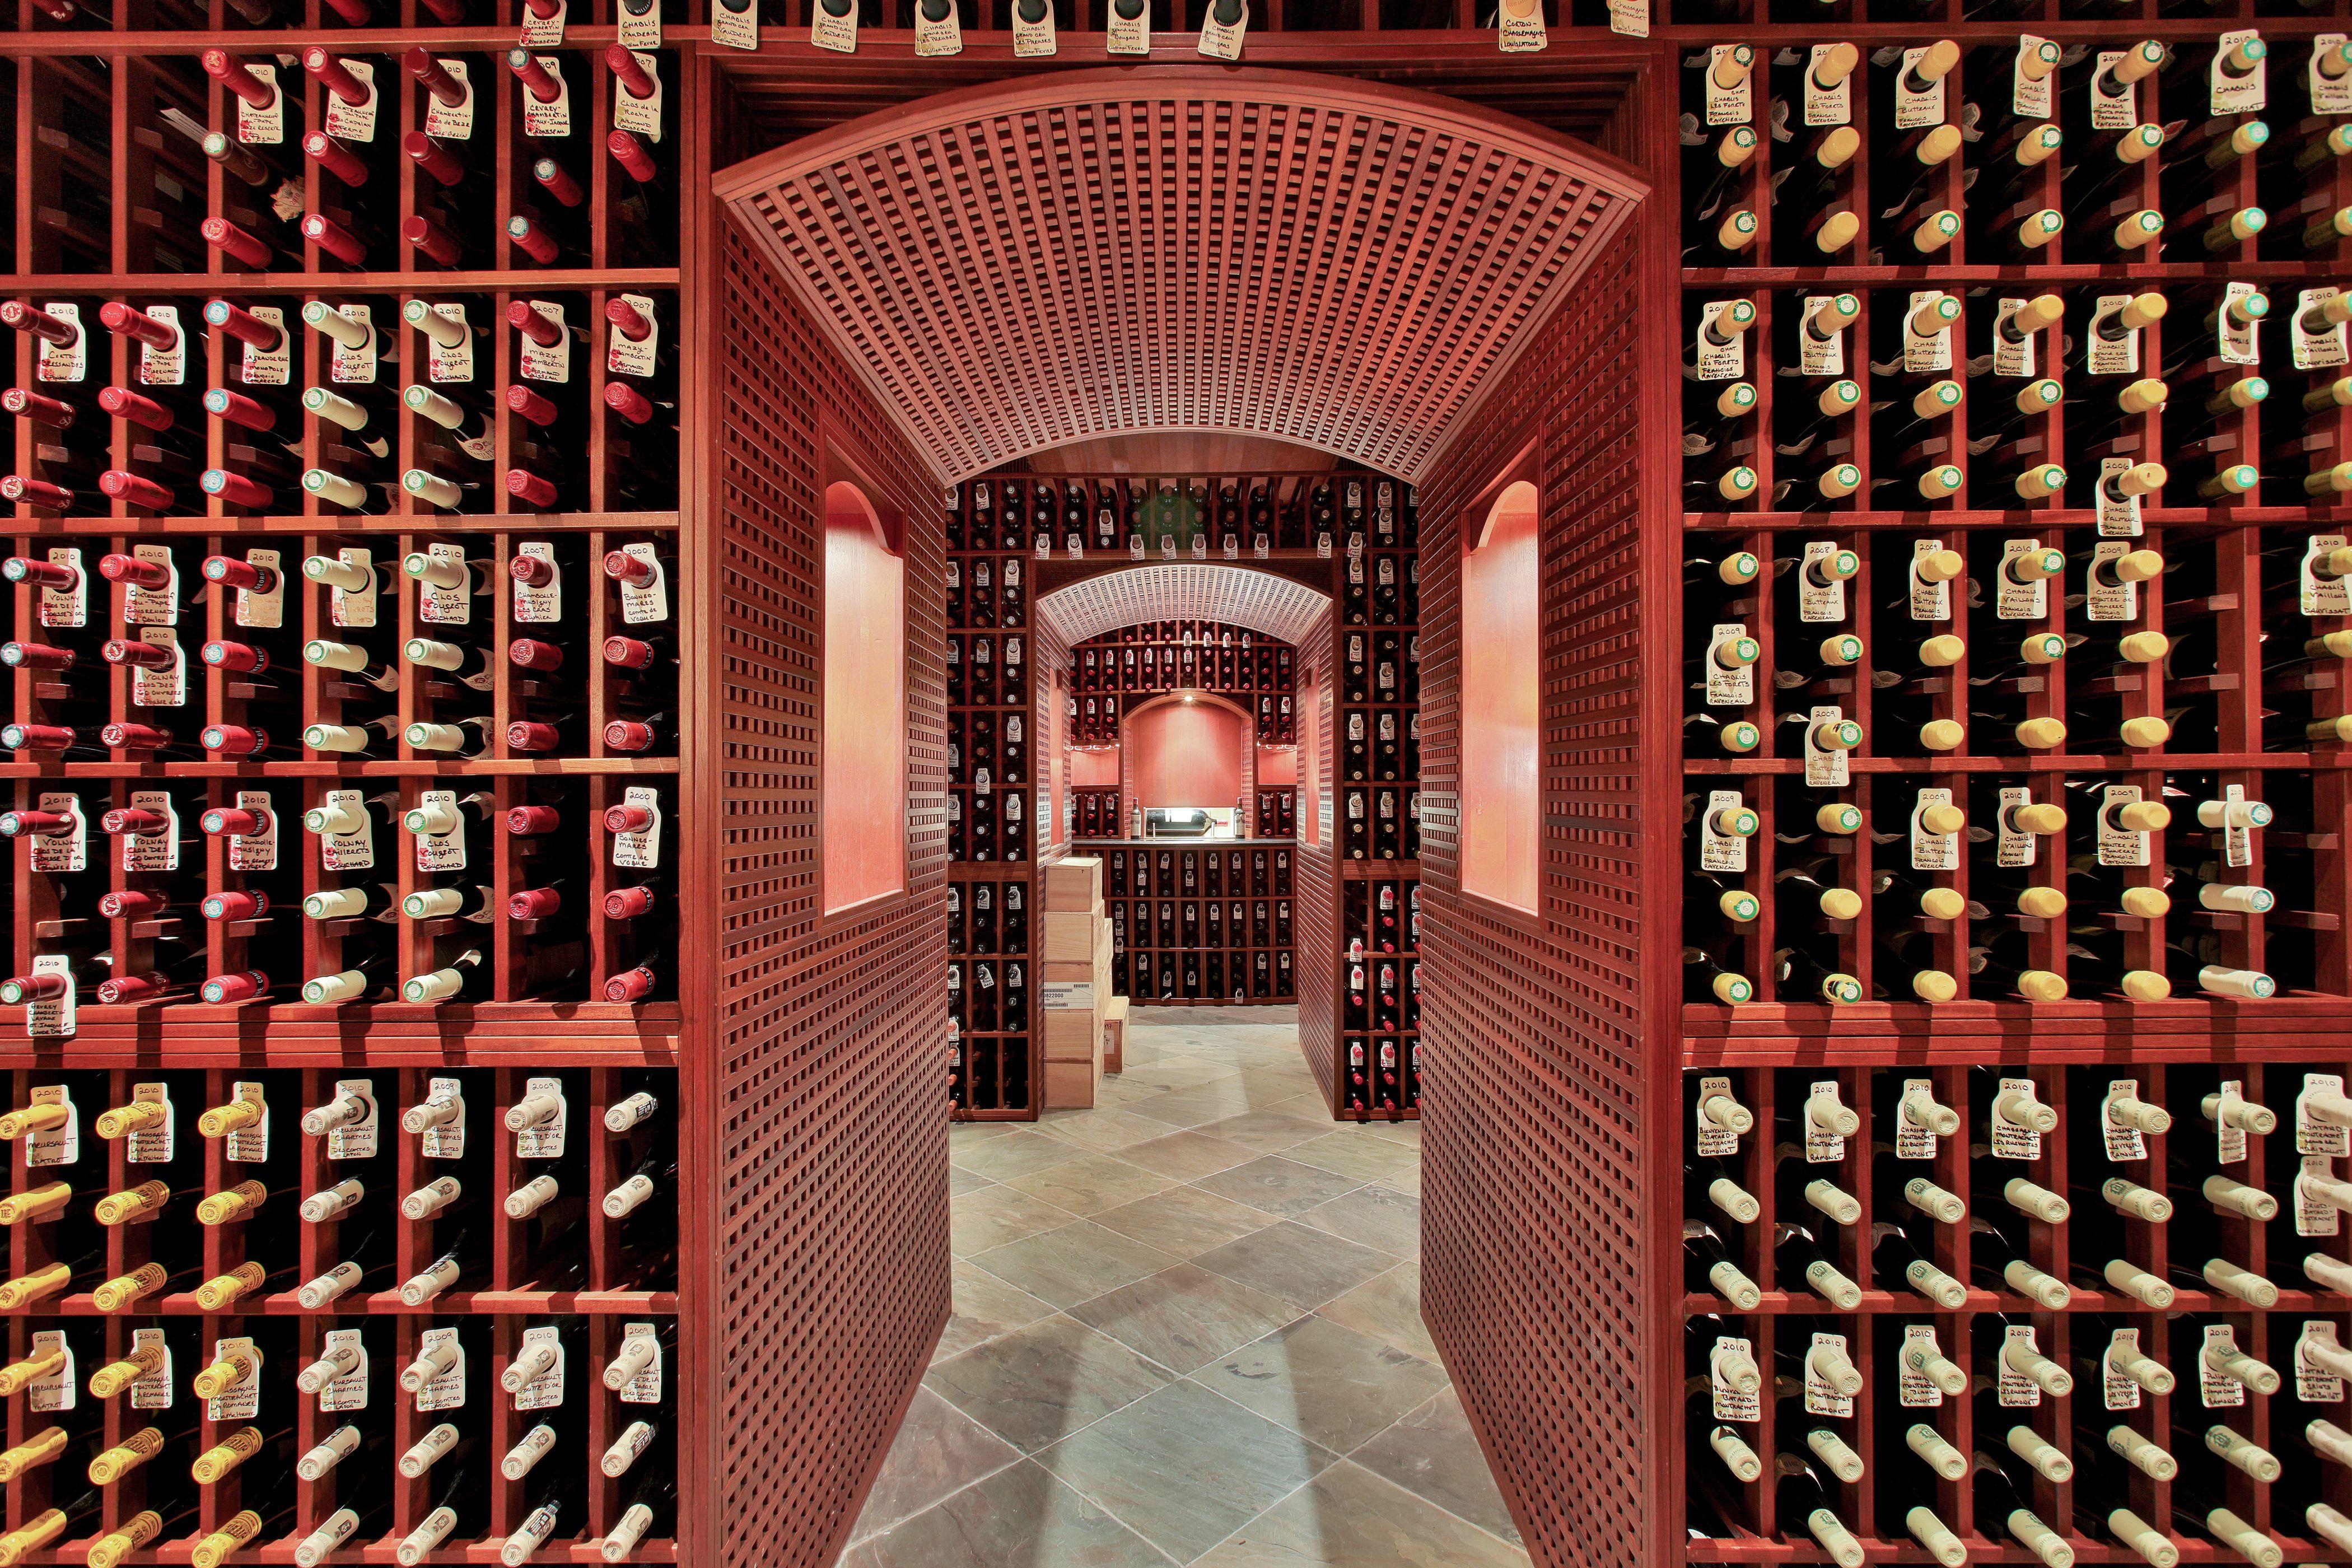 Pin On Wine Cellars